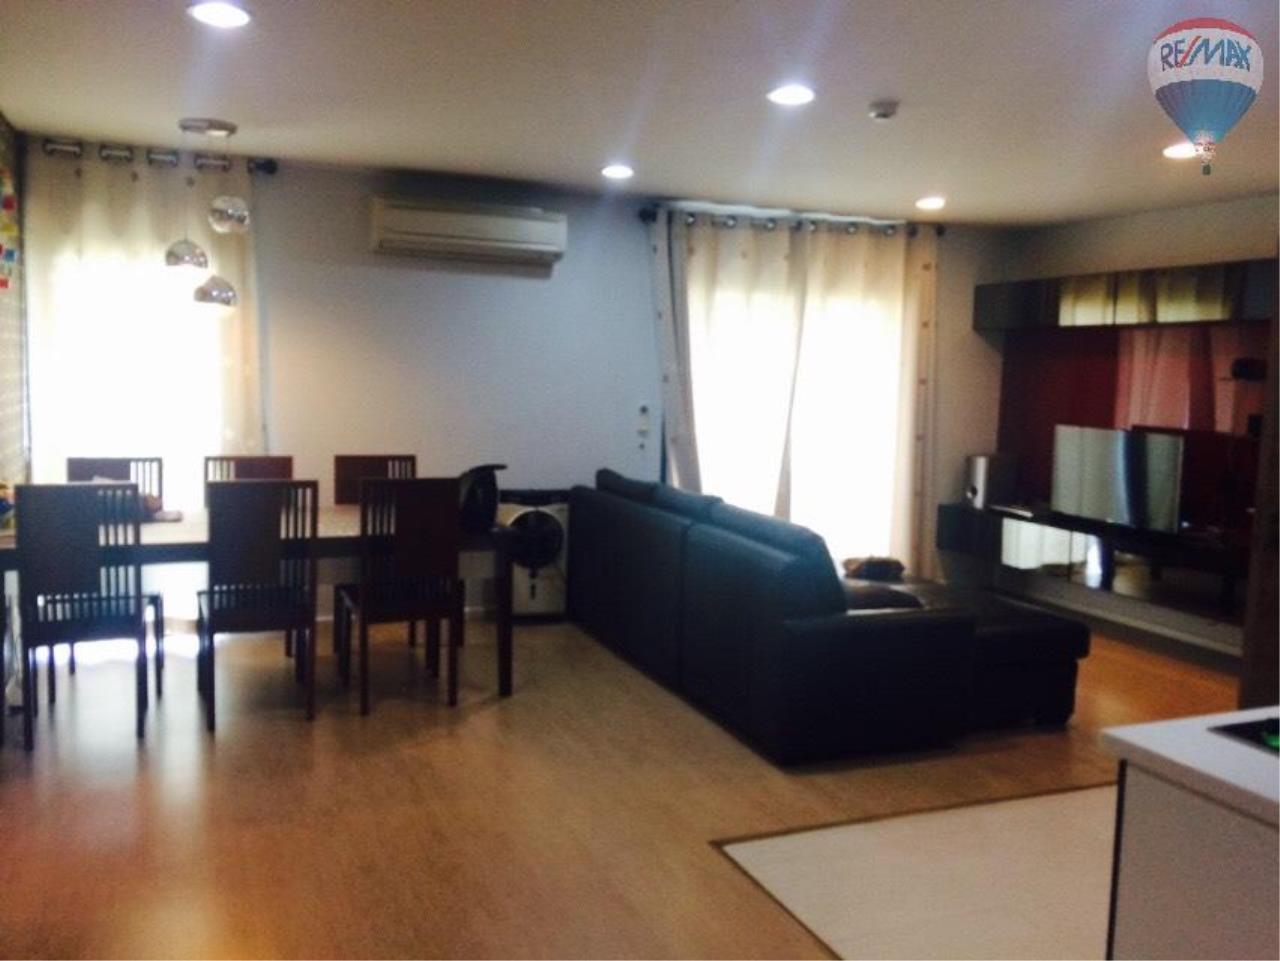 RE/MAX Properties Agency's Condominium for rent 2 bedrooms 92 Sq.m. at Renova Residence 18